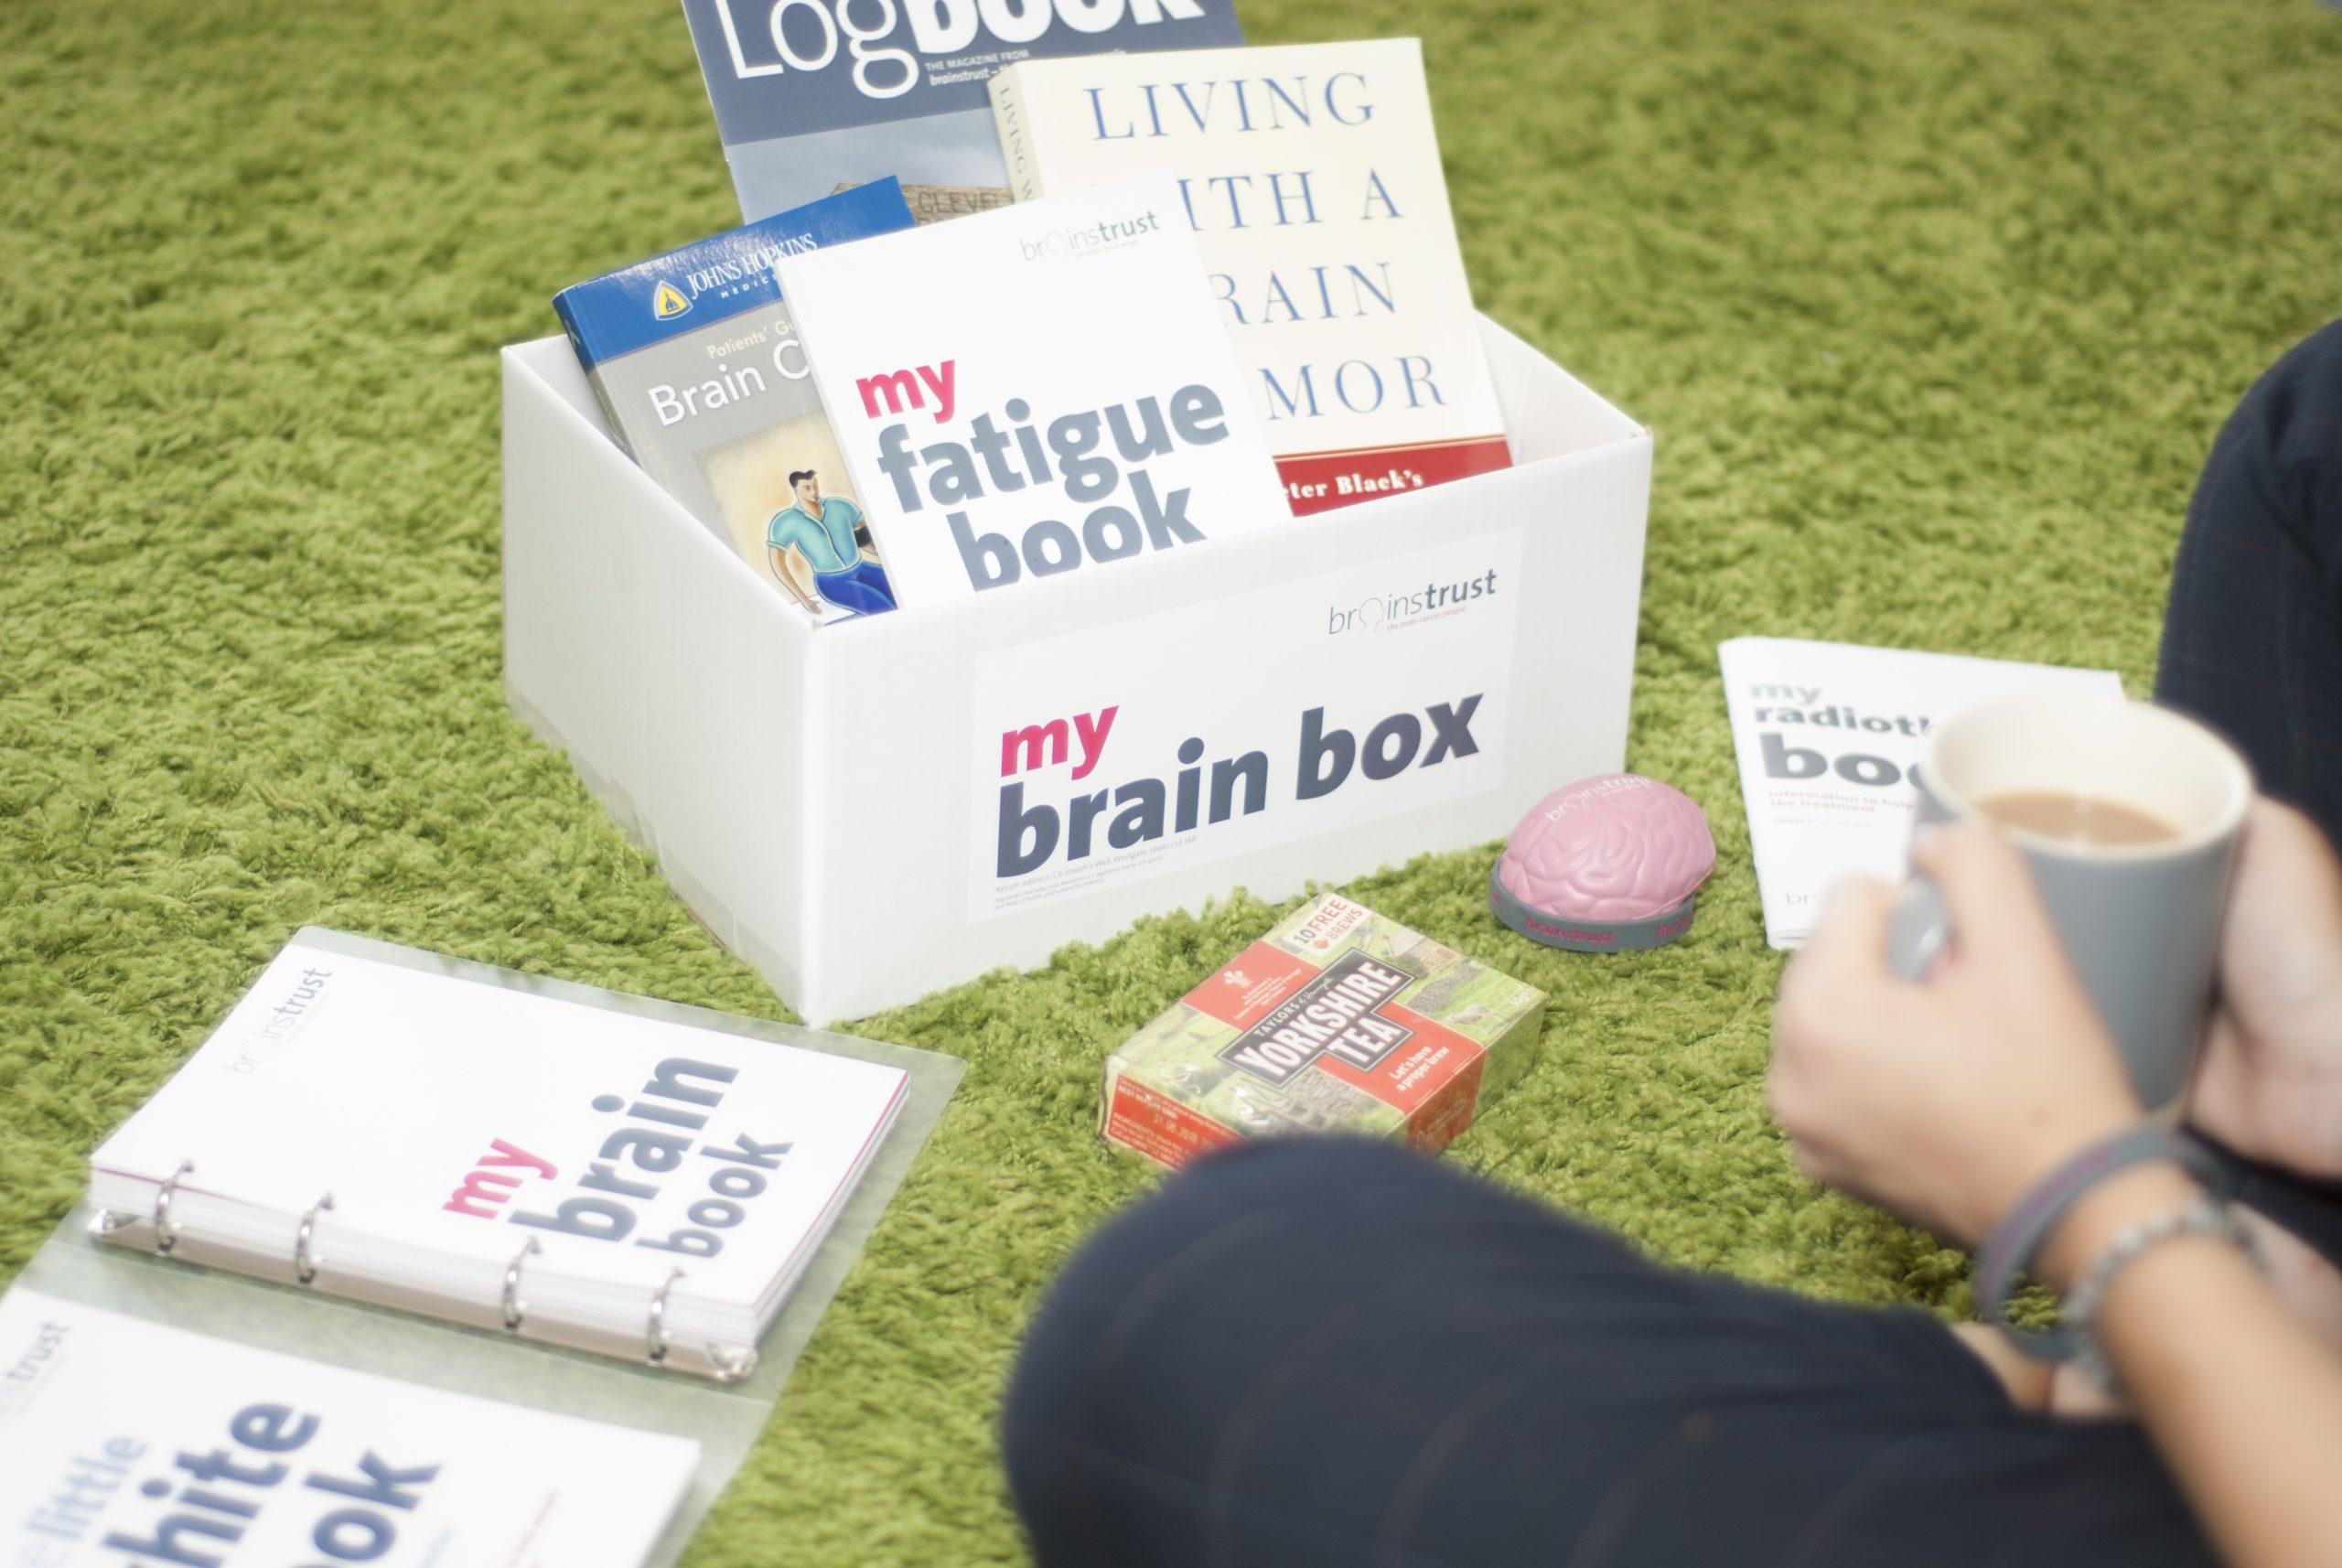 brain box image